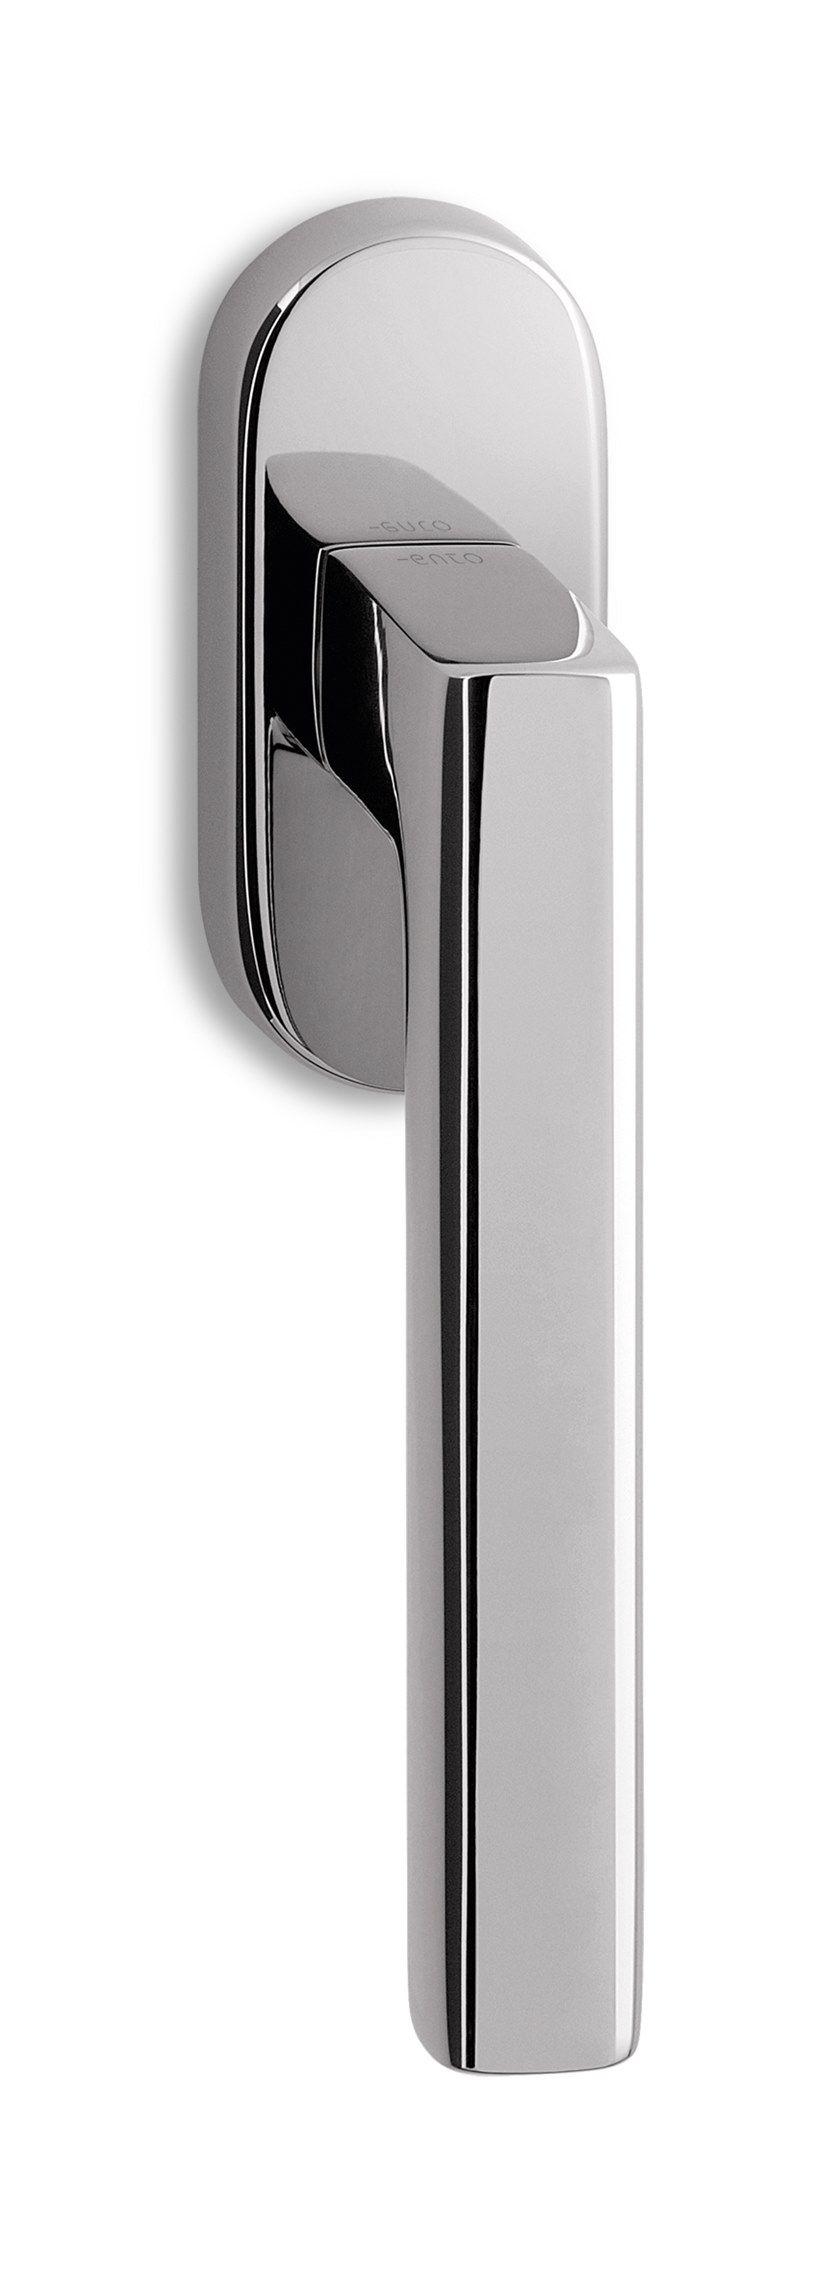 Brass window handle on rose UNIT | DK window handle by Ento